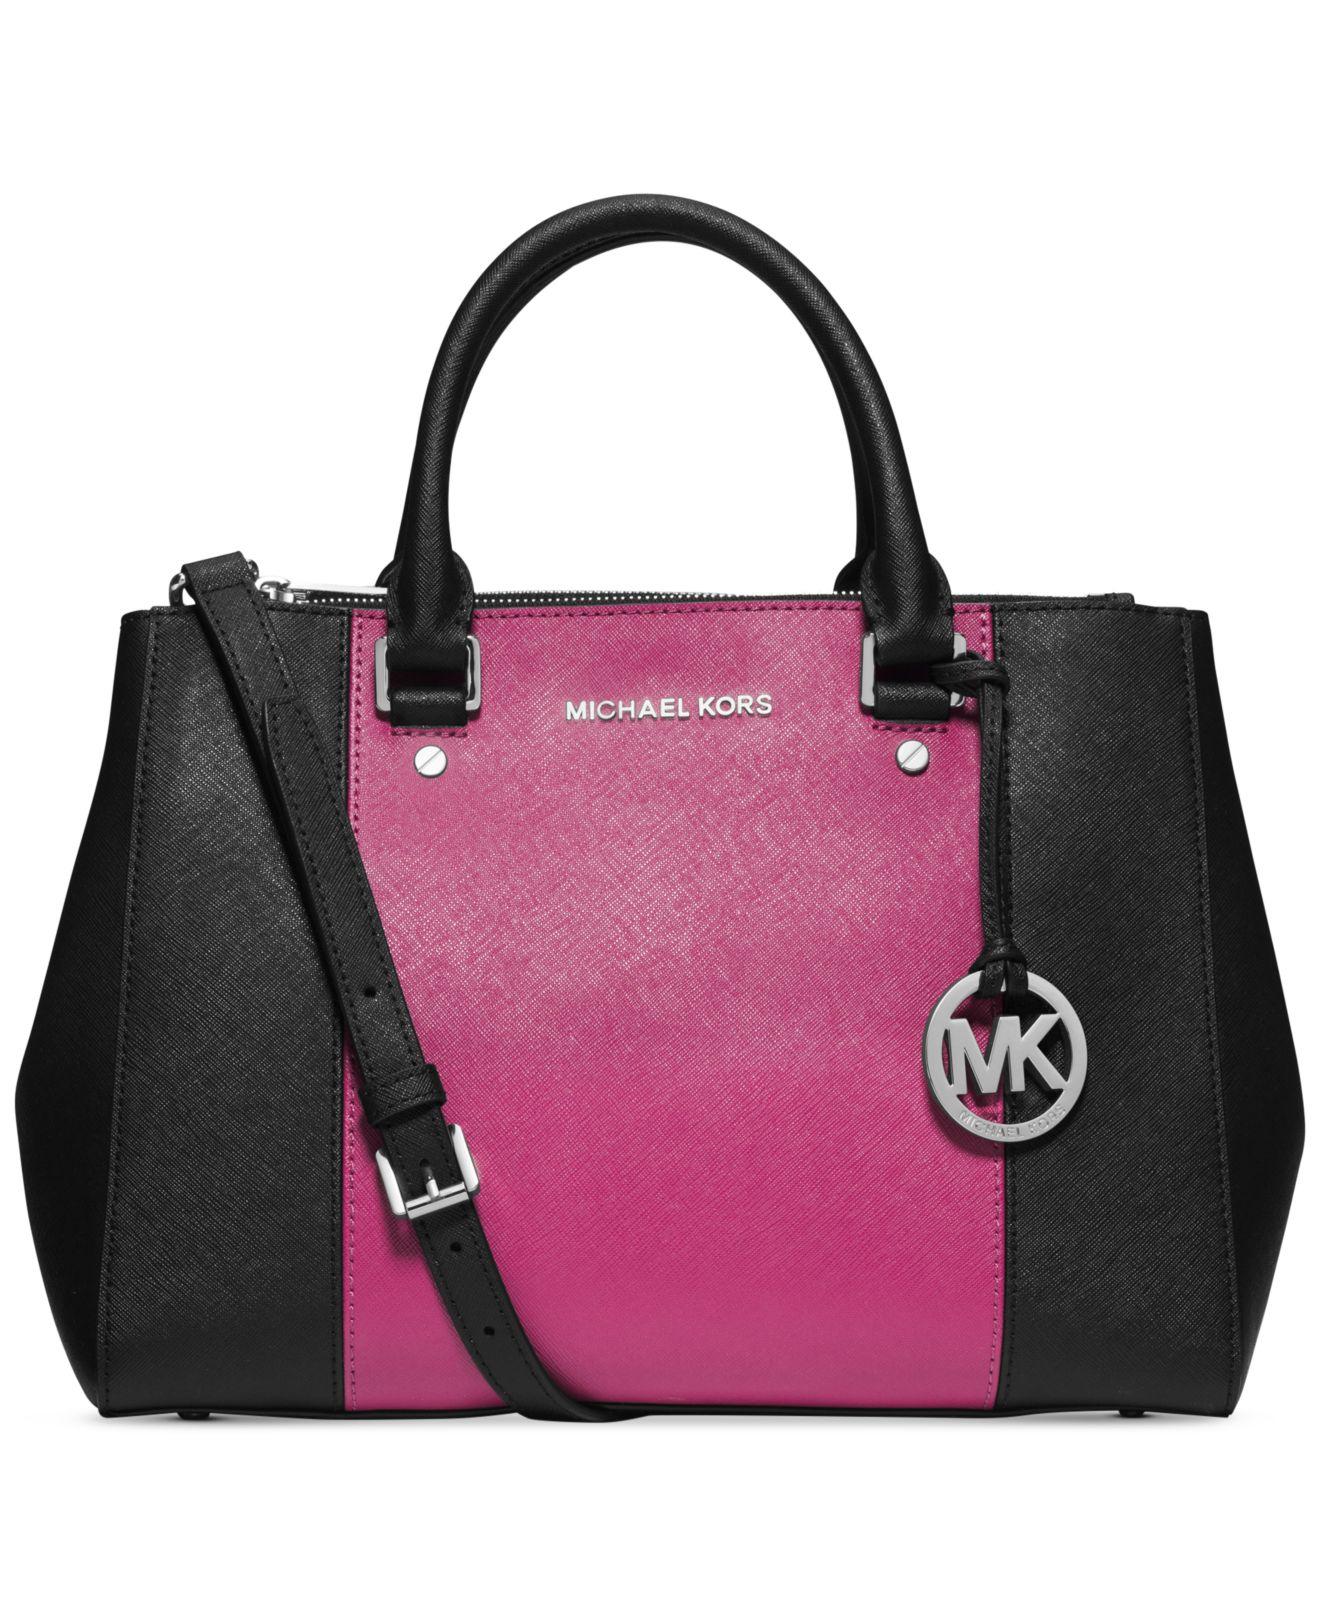 662413fd97 ... order lyst michael kors michael sutton center stripe medium satchel in  41334 f71e7